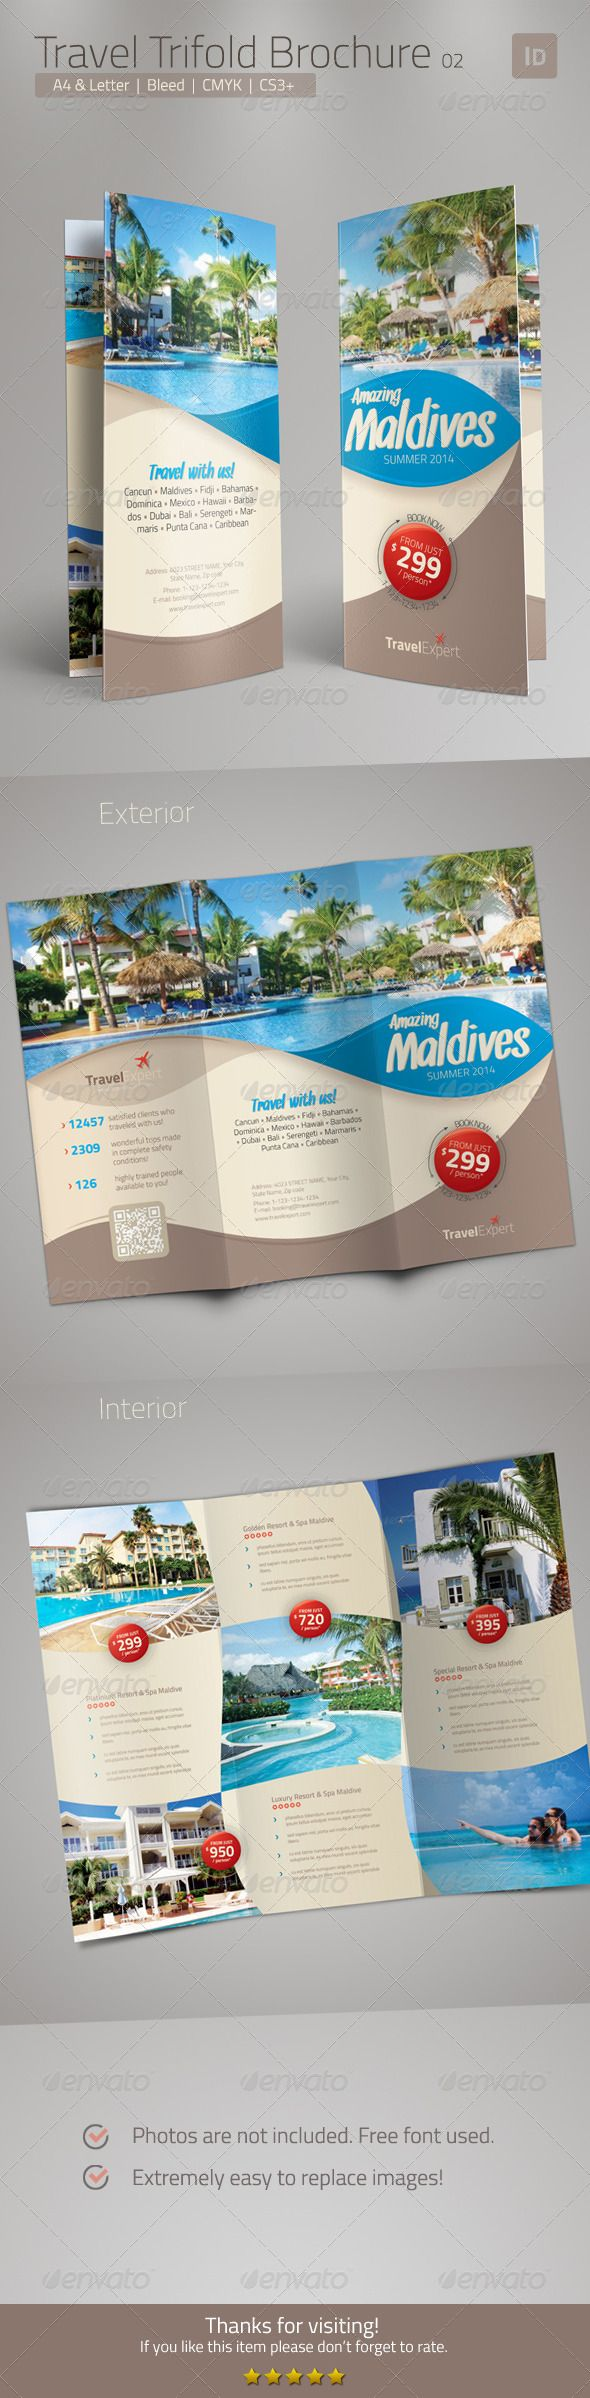 pin by bashooka web graphic design on fantastic travel brochure